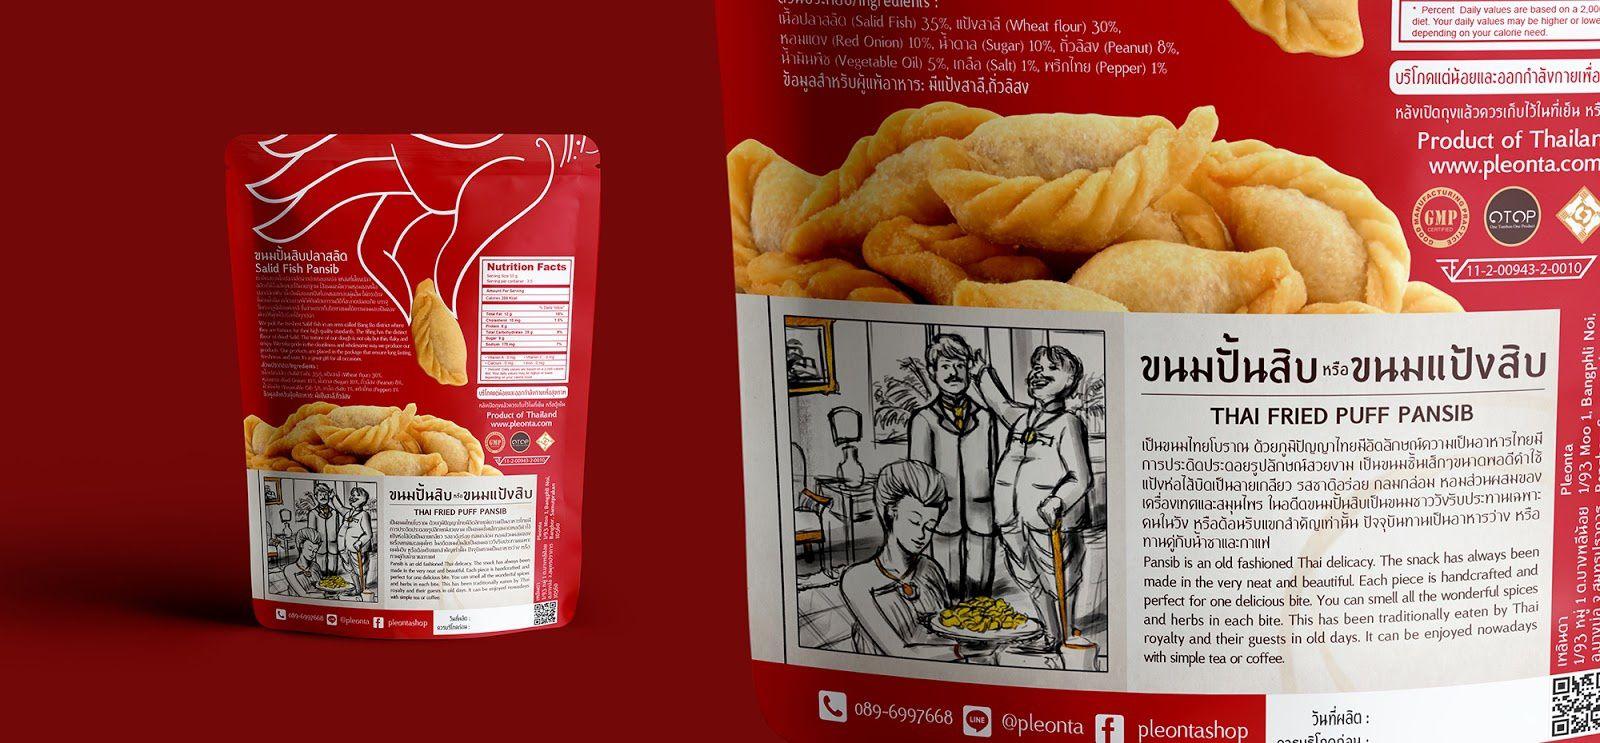 Pleonta (snack traditionnel thaïlandais) I Design : Prompt Partners, Thaïlande (mai 2017)